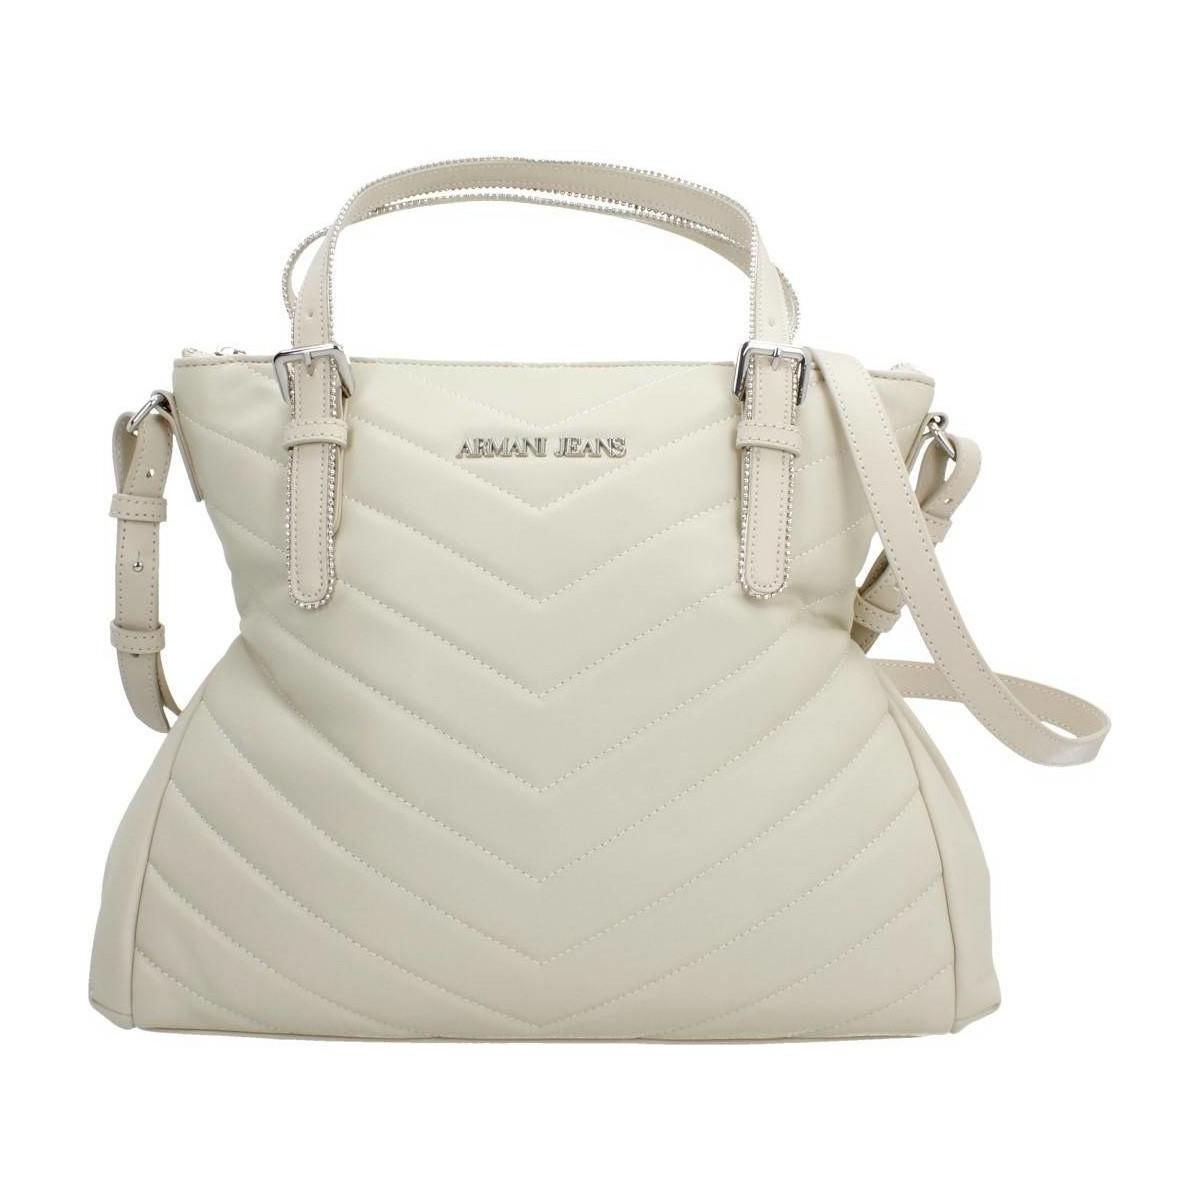 Armani Jeans. Natural Borsa Shopping Giord Women's Shopper Bag In Beige 409fd0df2c2a